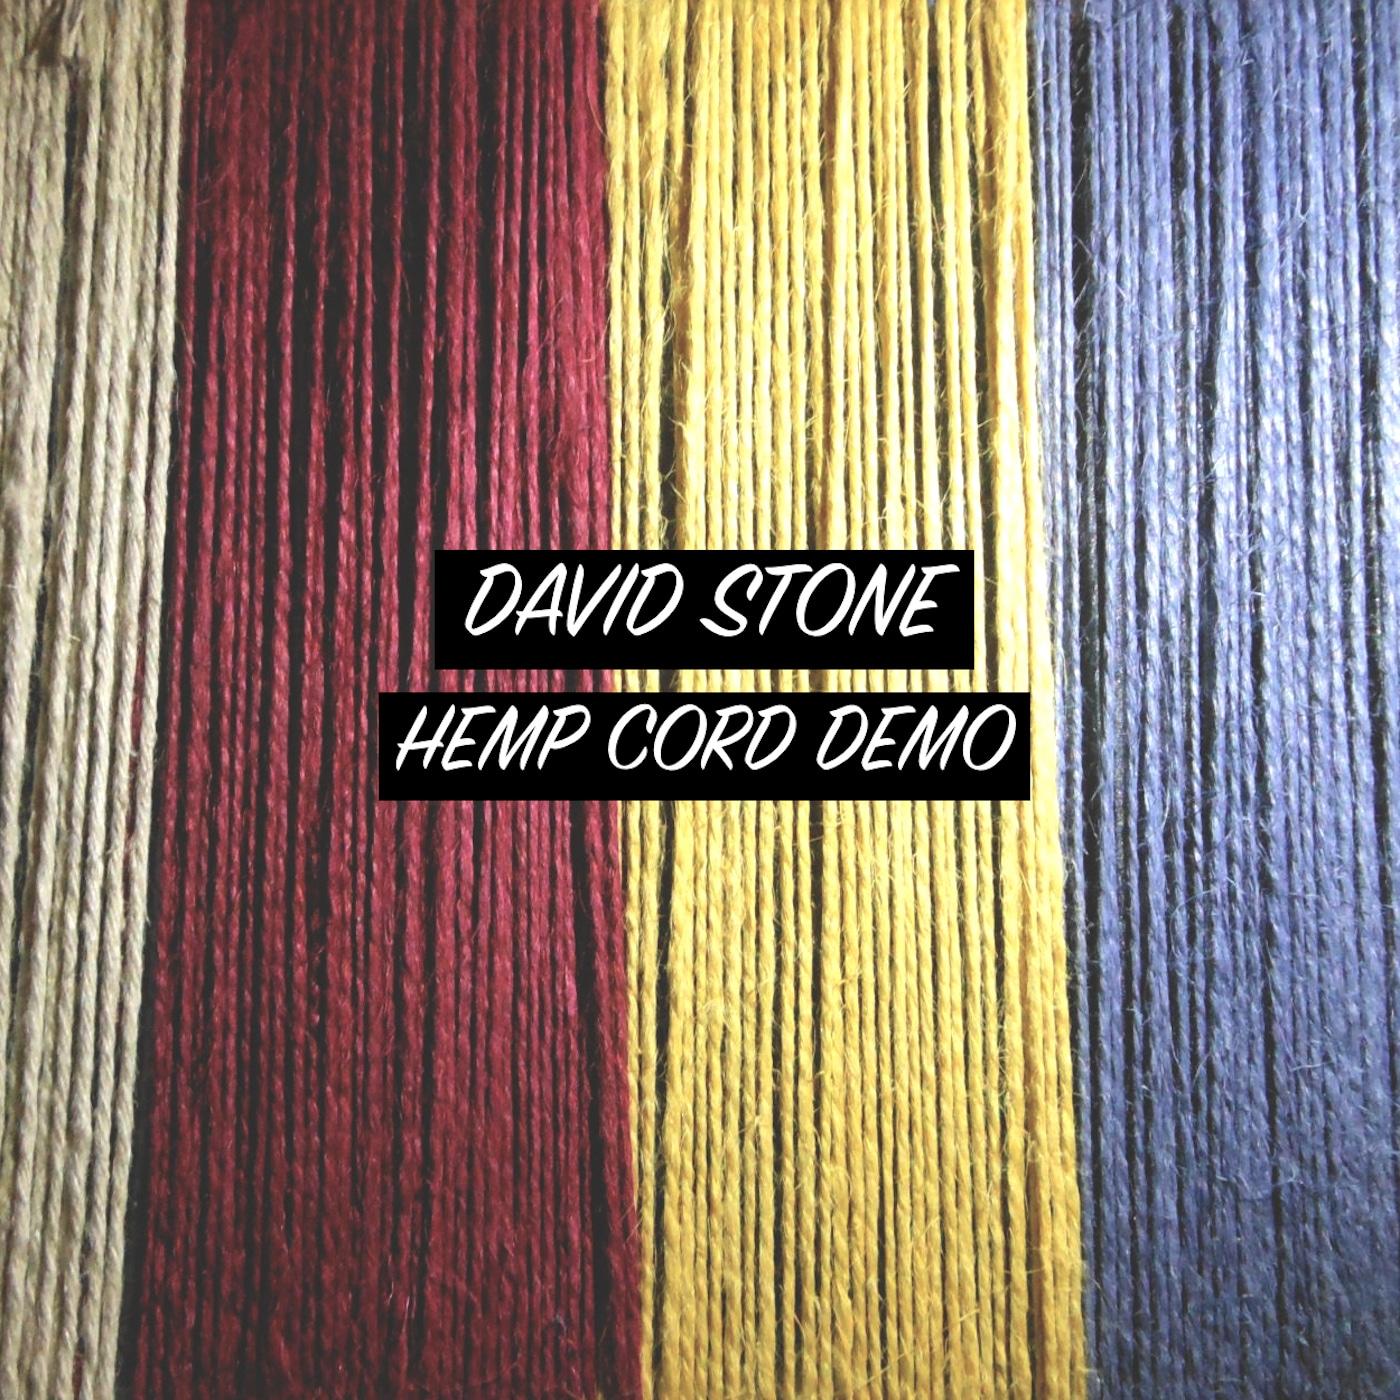 David Stone - Hemp Cord Demo